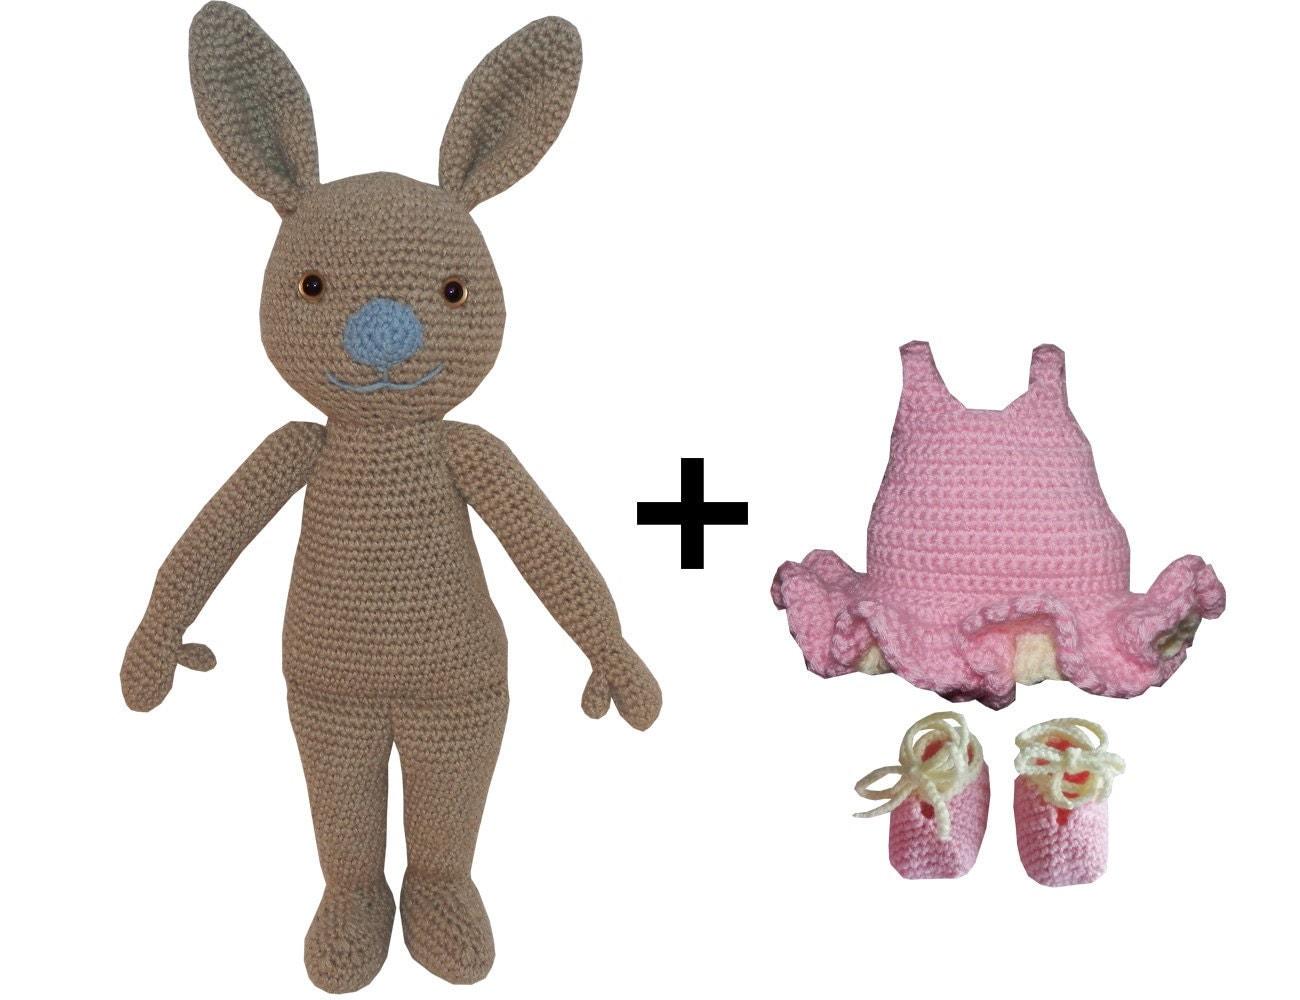 Amigurumi Crochet Dress : Items similar to Amigurumi Crochet Pattern: Ballerina ...